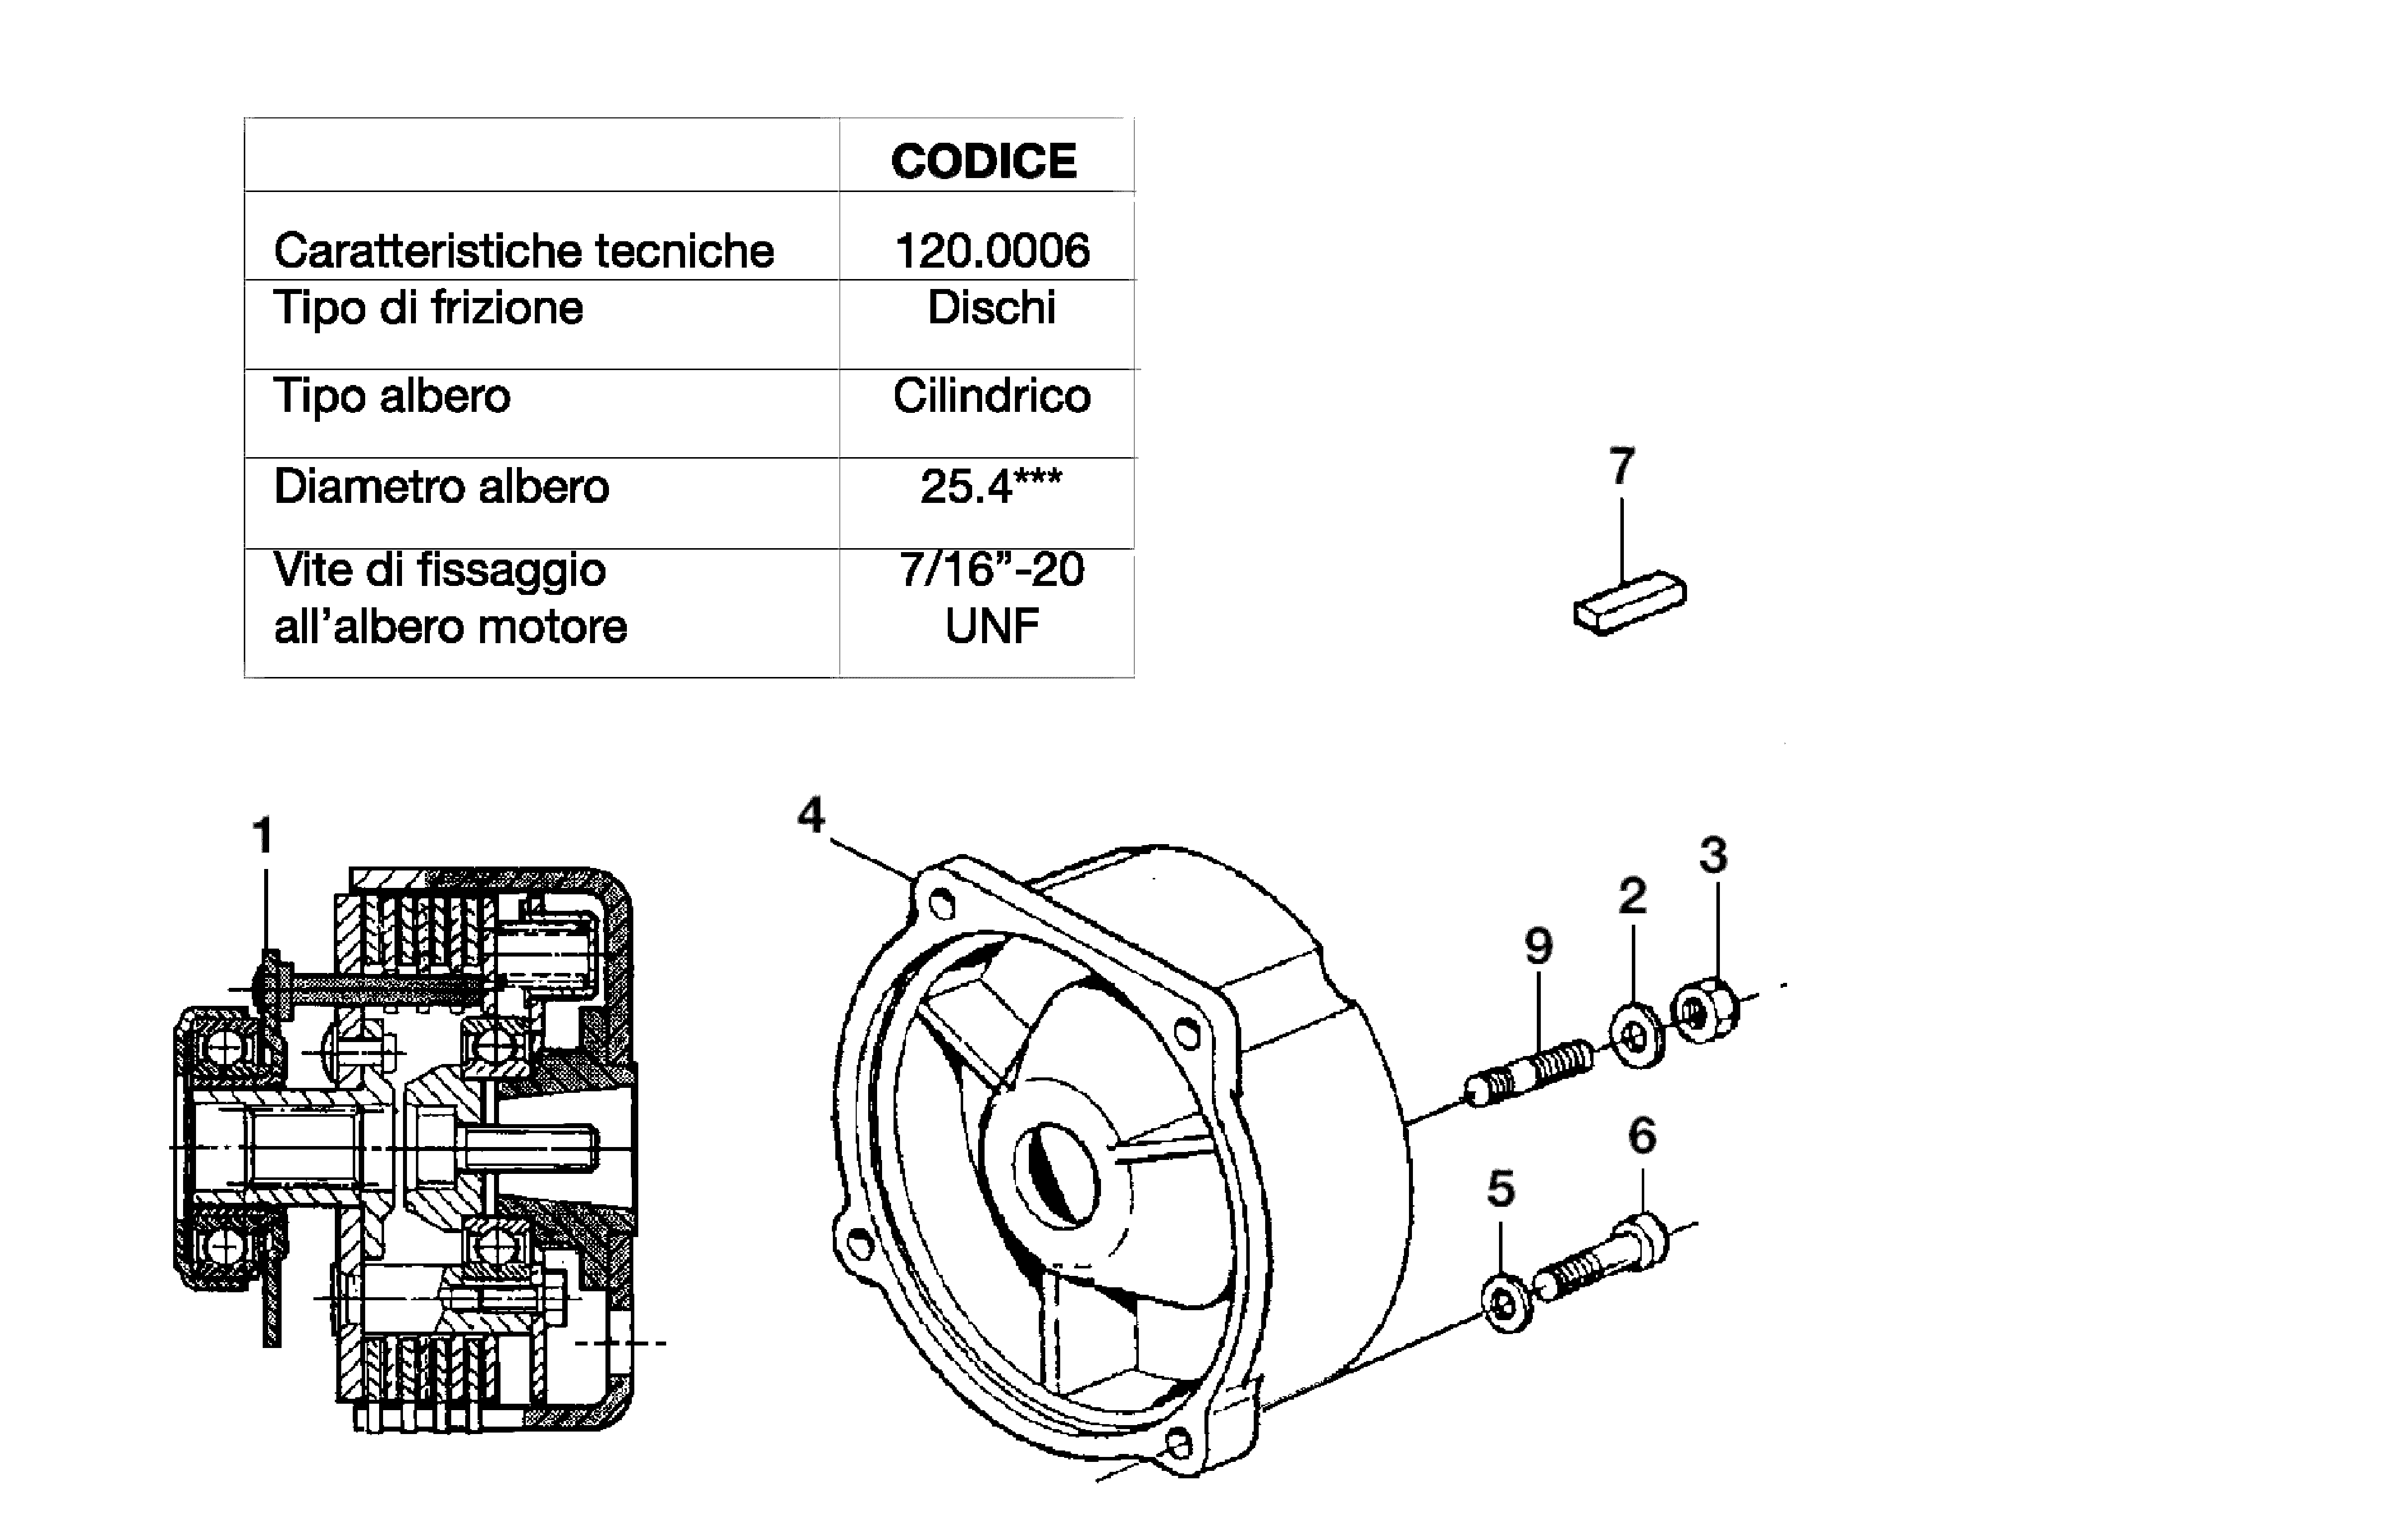 KAM 5 HF Motoculteur  OLEOMAC NIBBI vue éclatée  Dessins pièces -  Embrayage